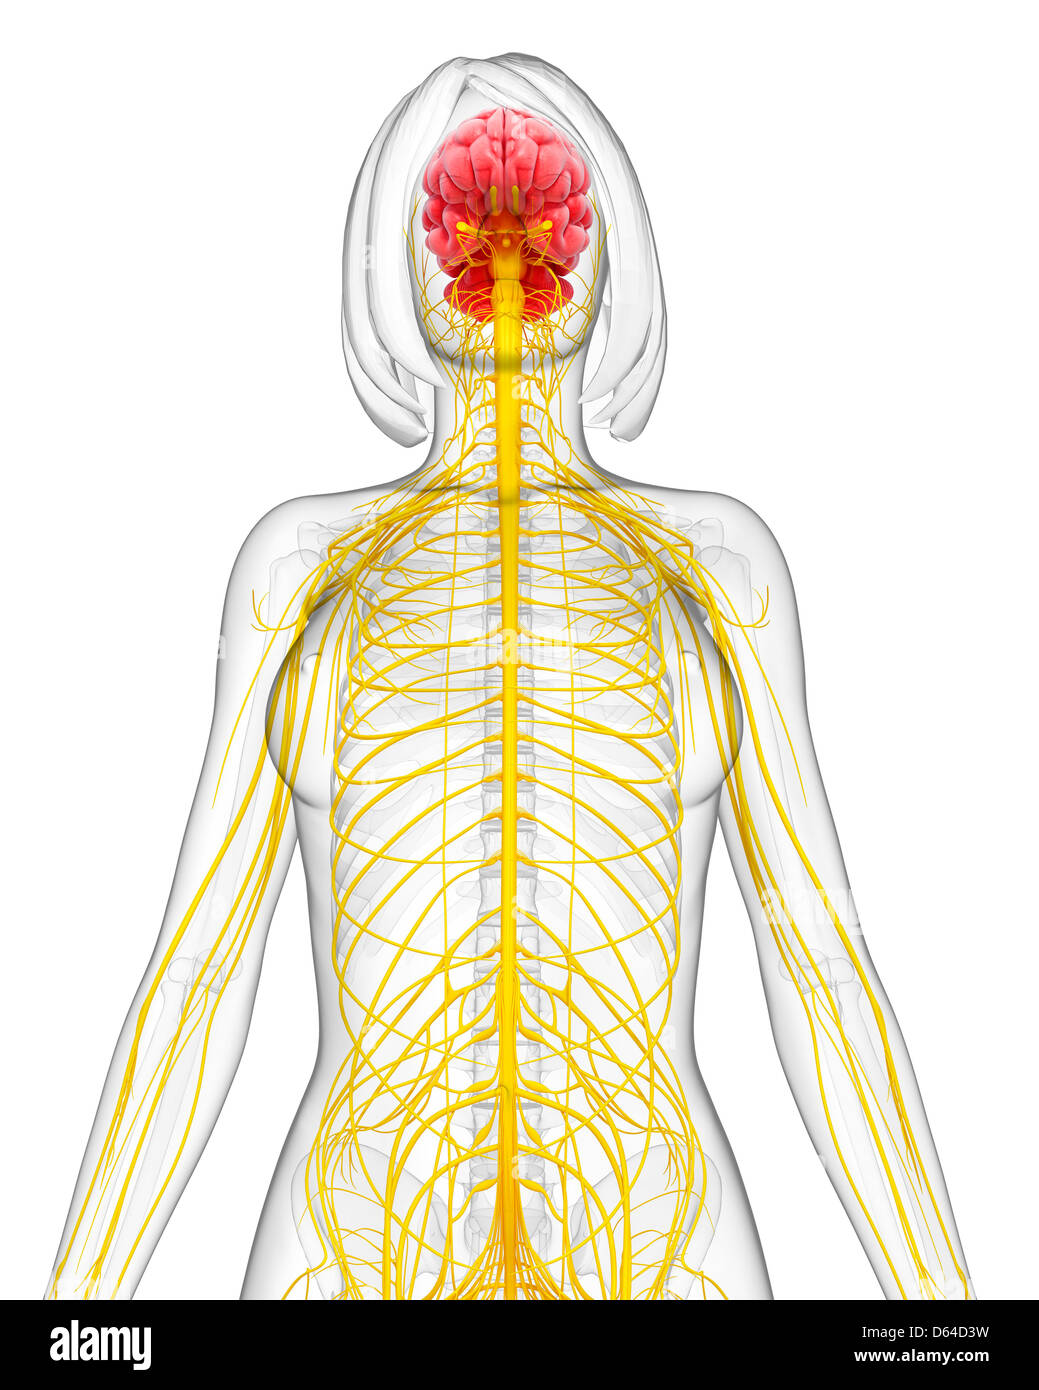 Female nervous system artwork stock photo 55417149 alamy female nervous system artwork ccuart Images